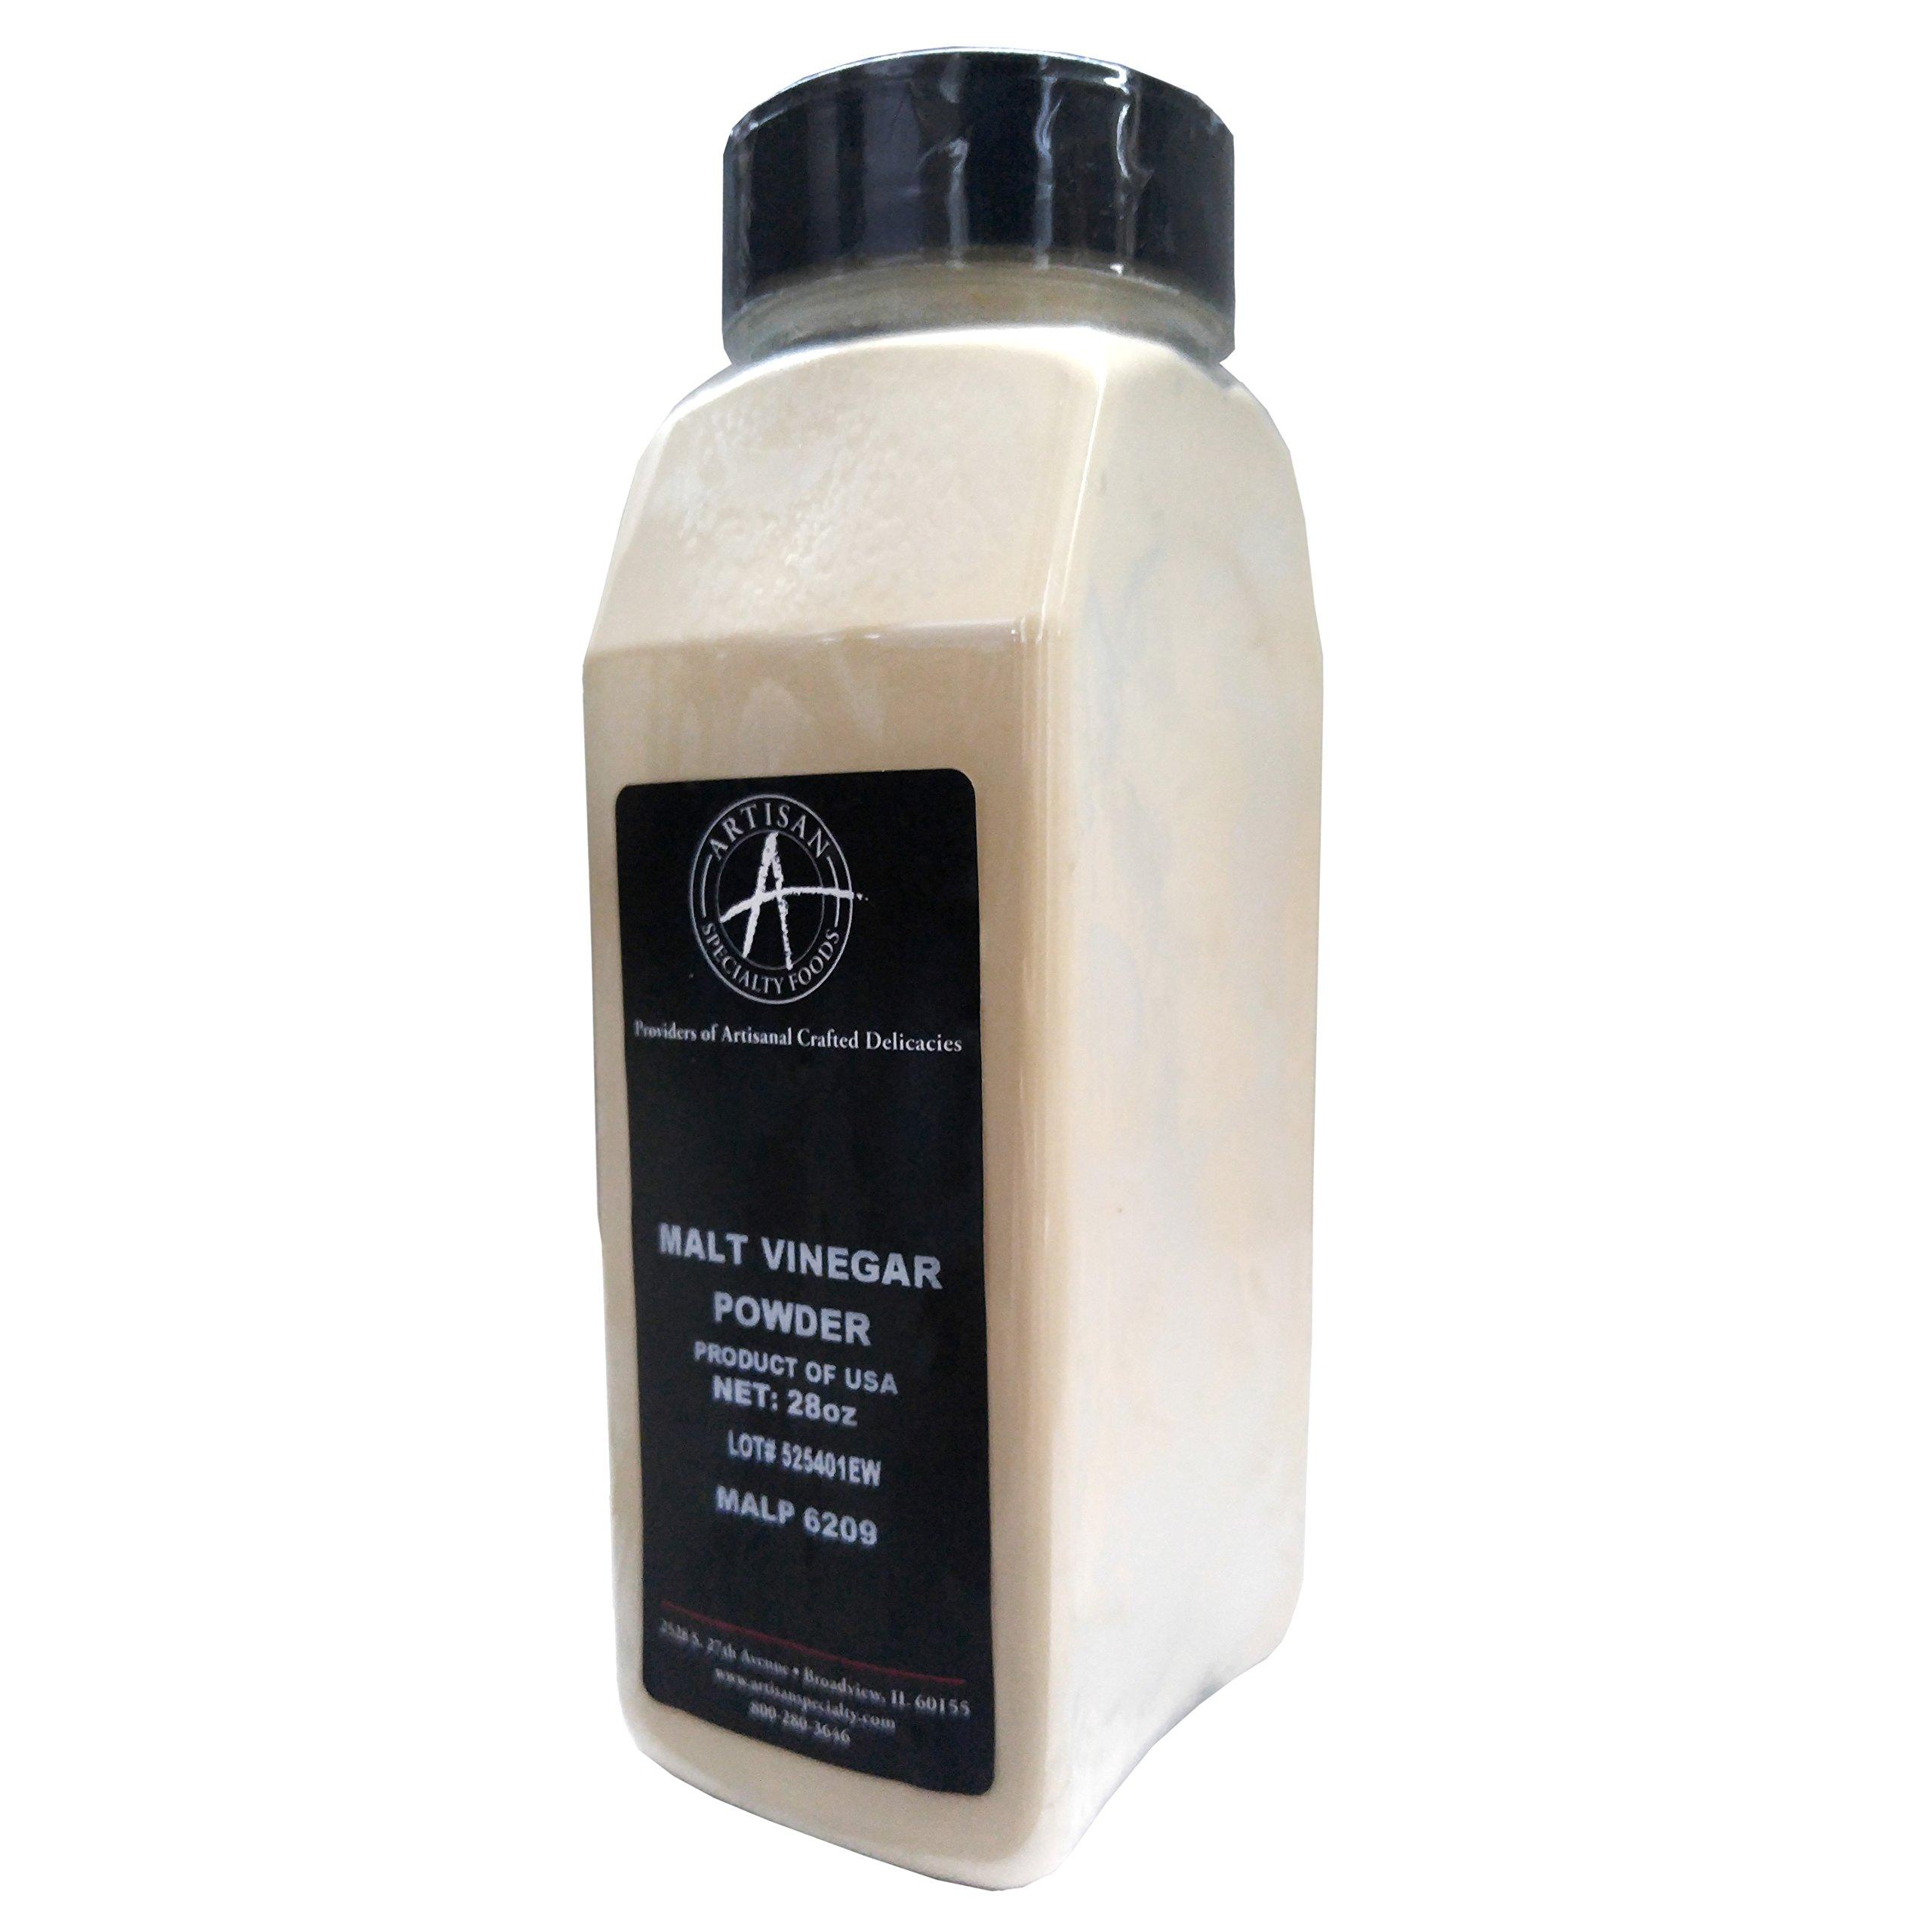 Malt Vinegar Powder - 28 oz